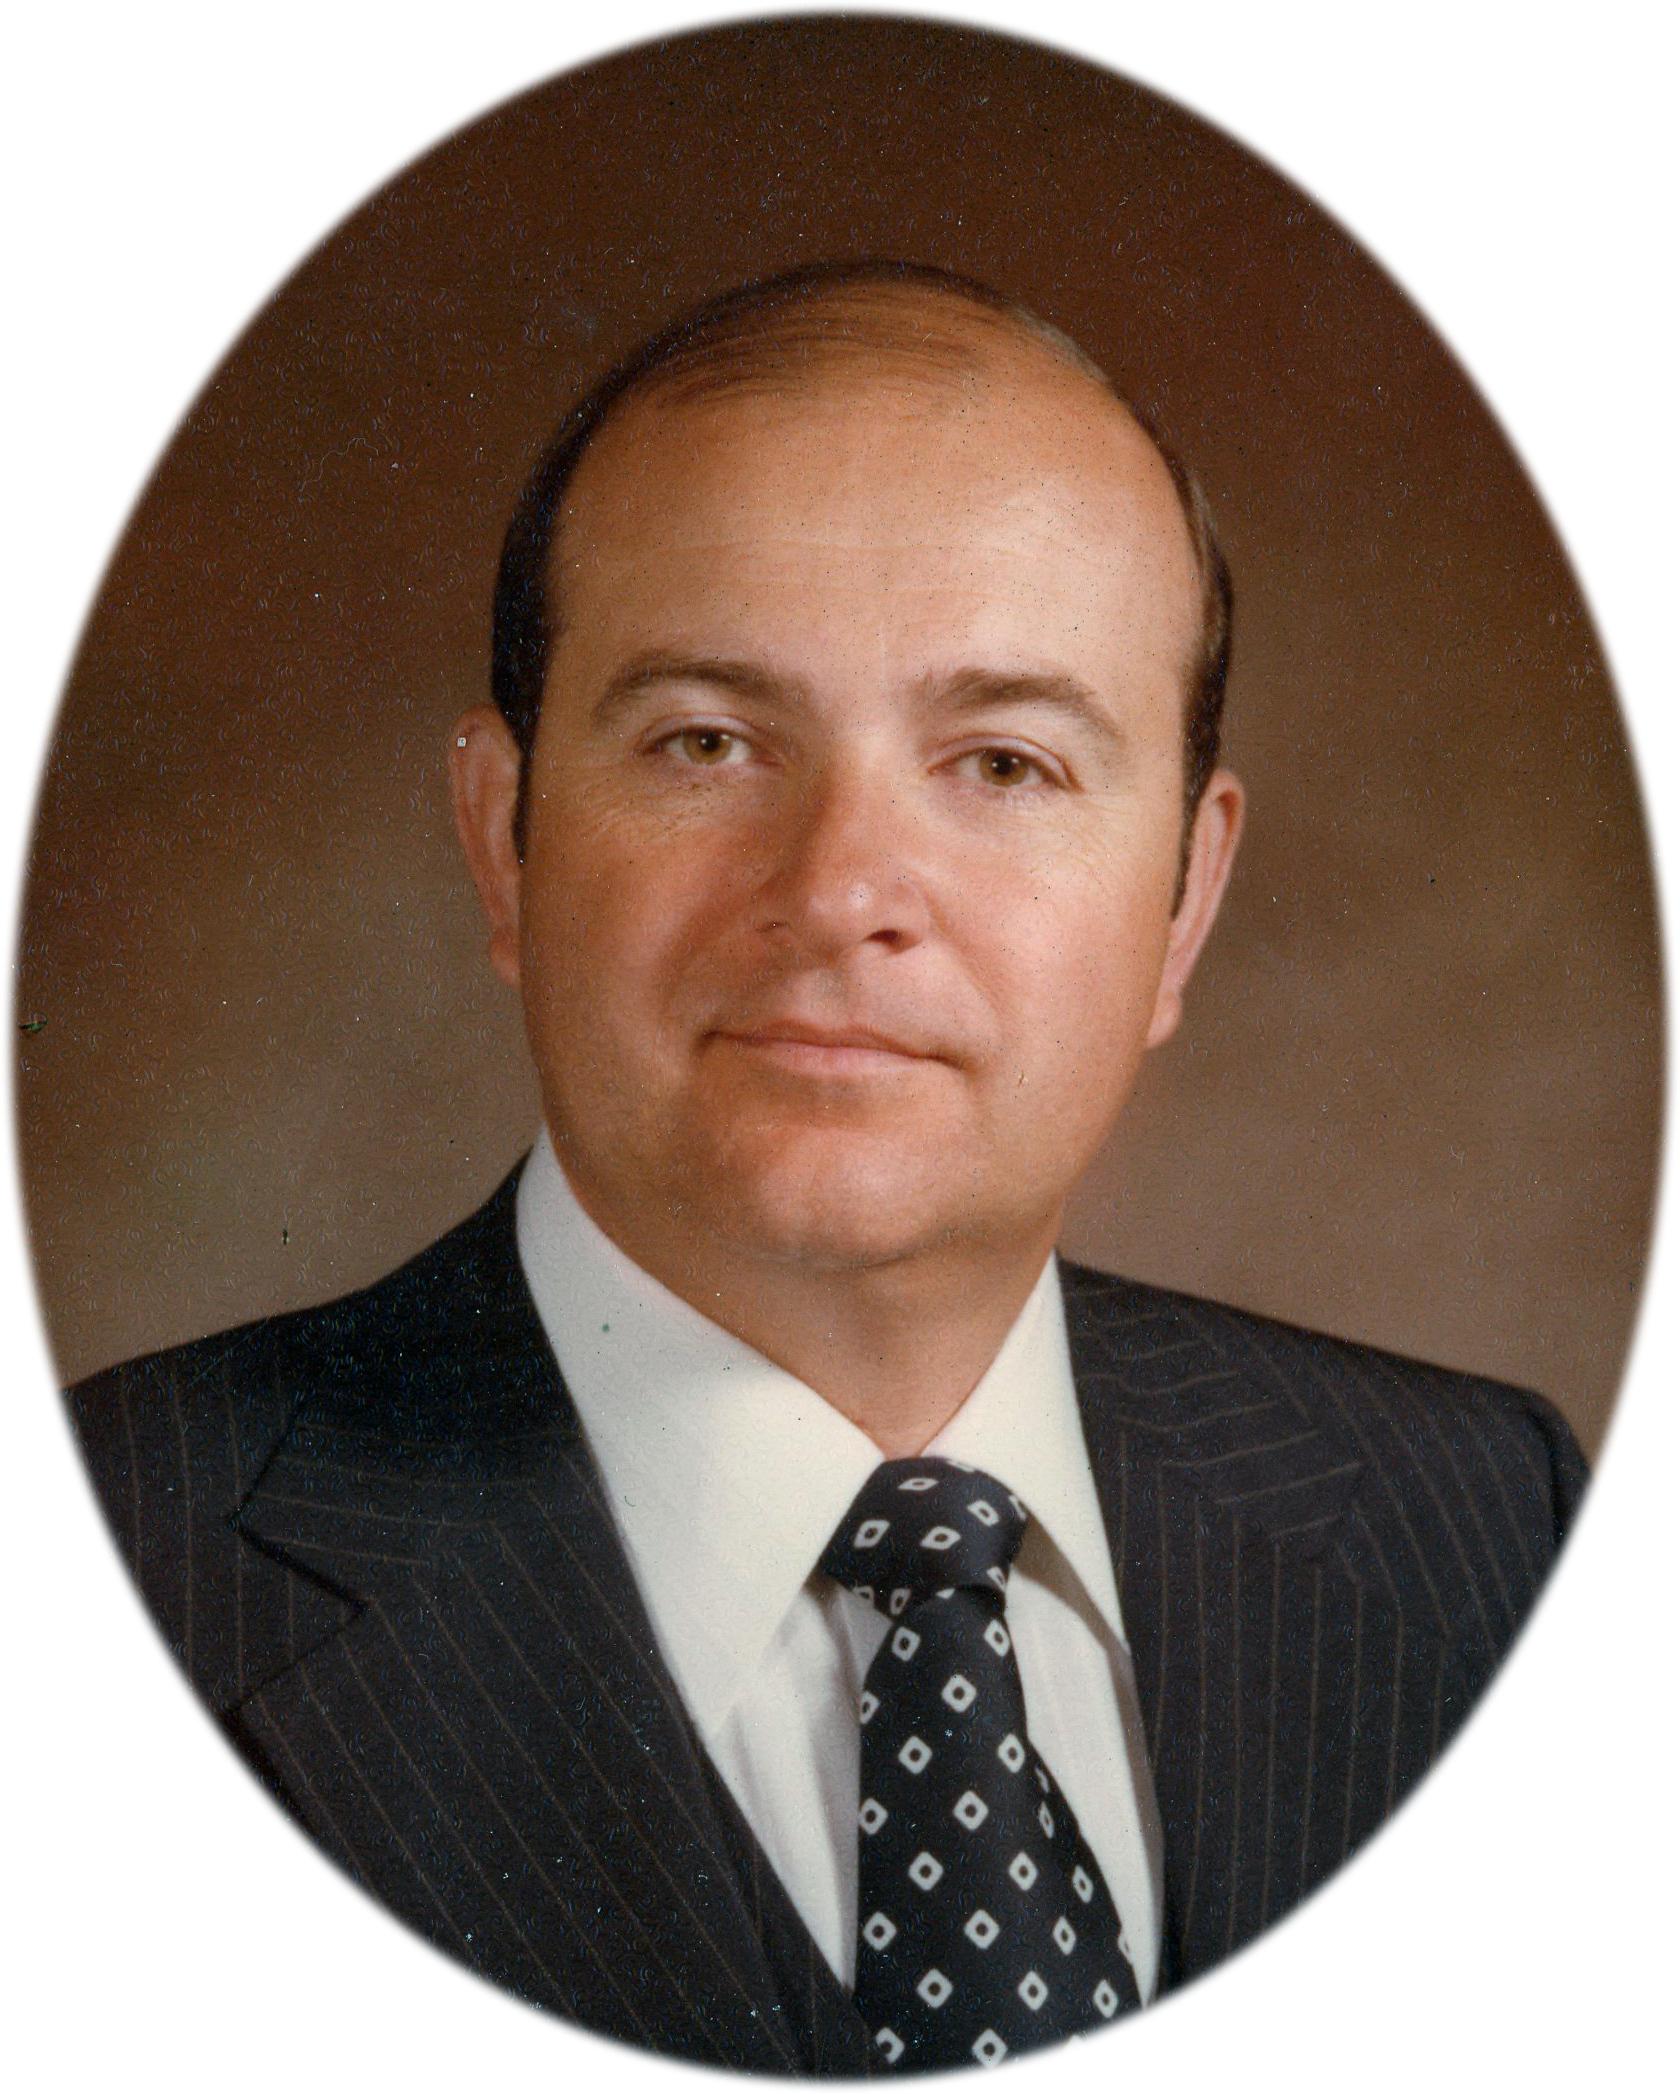 Michael J. Mooney